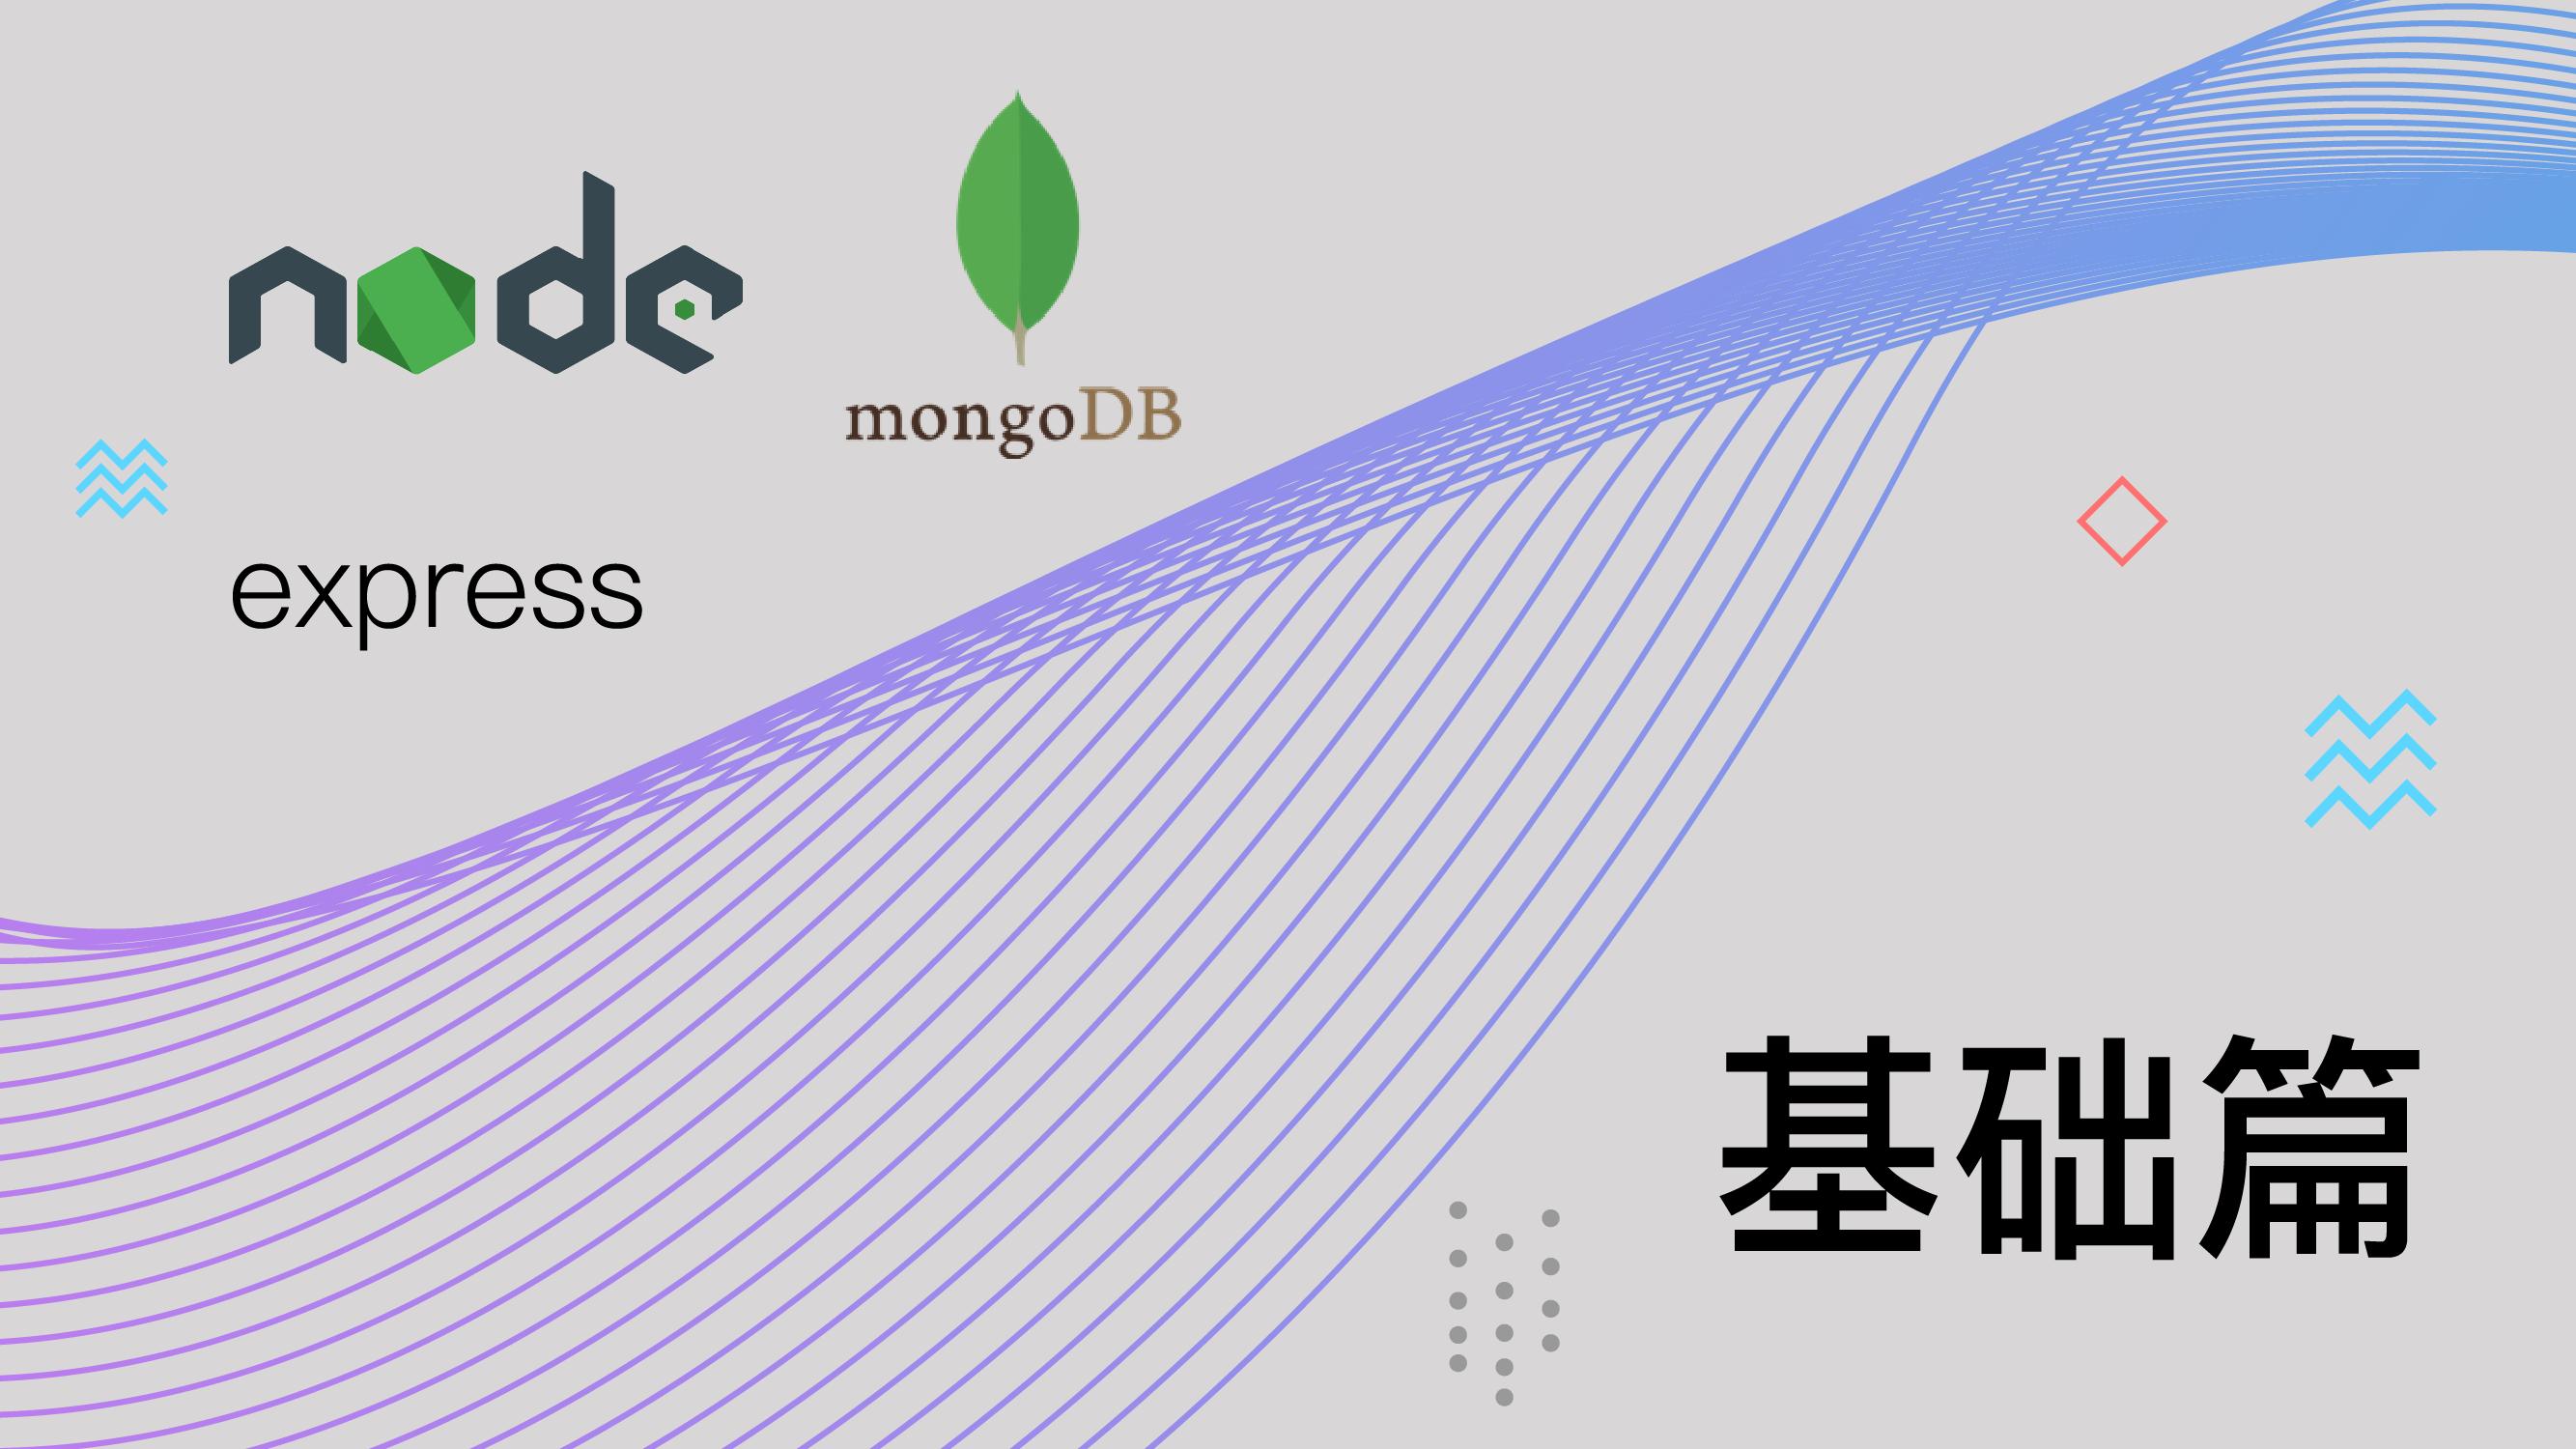 Nodejs + Express + MongoDB 基础篇